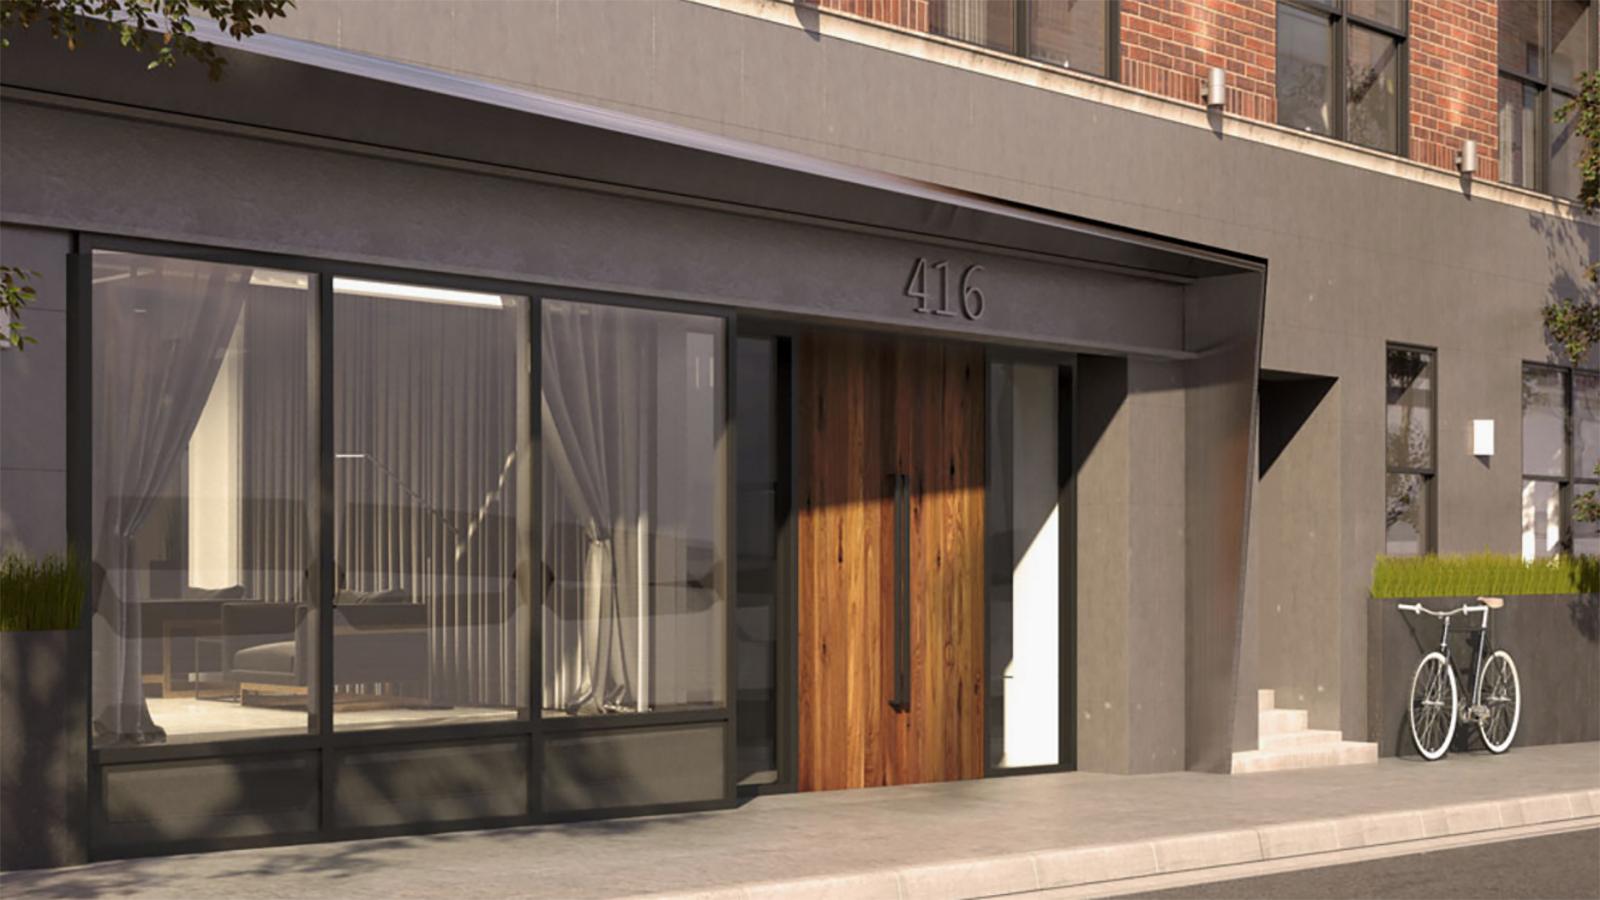 NINE52, 416 West 52nd Street